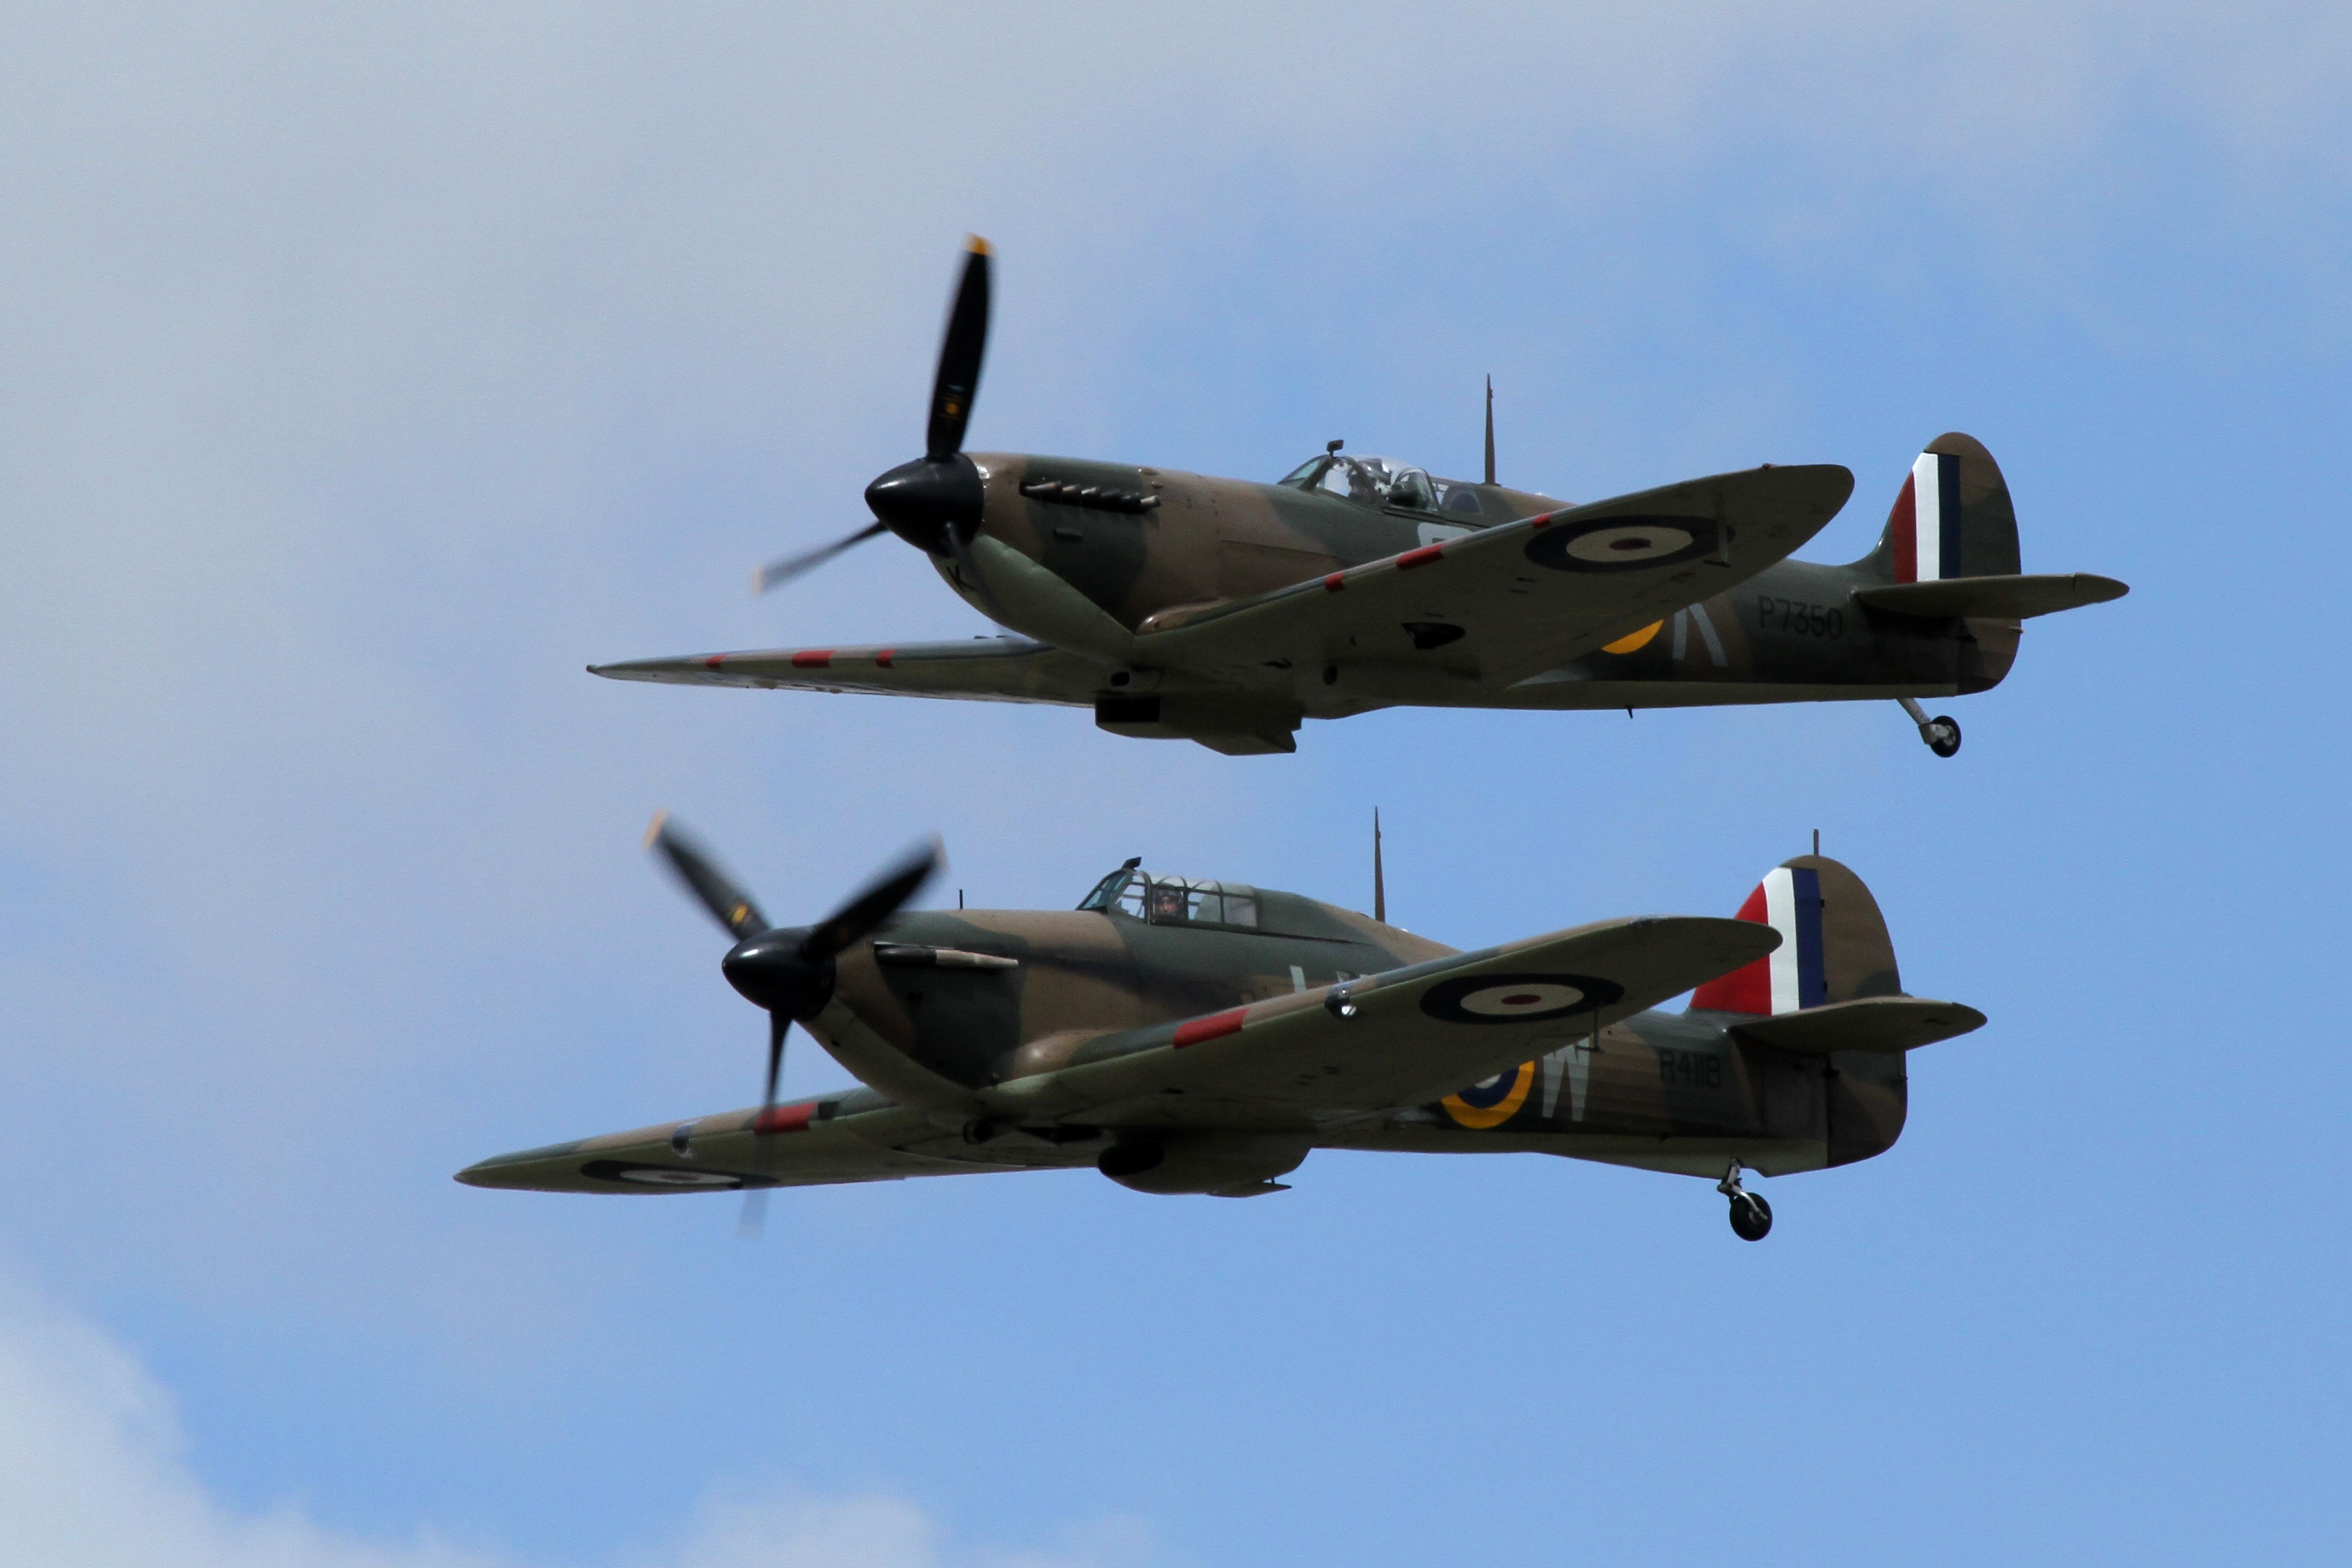 File:Hurricane and Spitfire 01 (4817630963).jpg ...